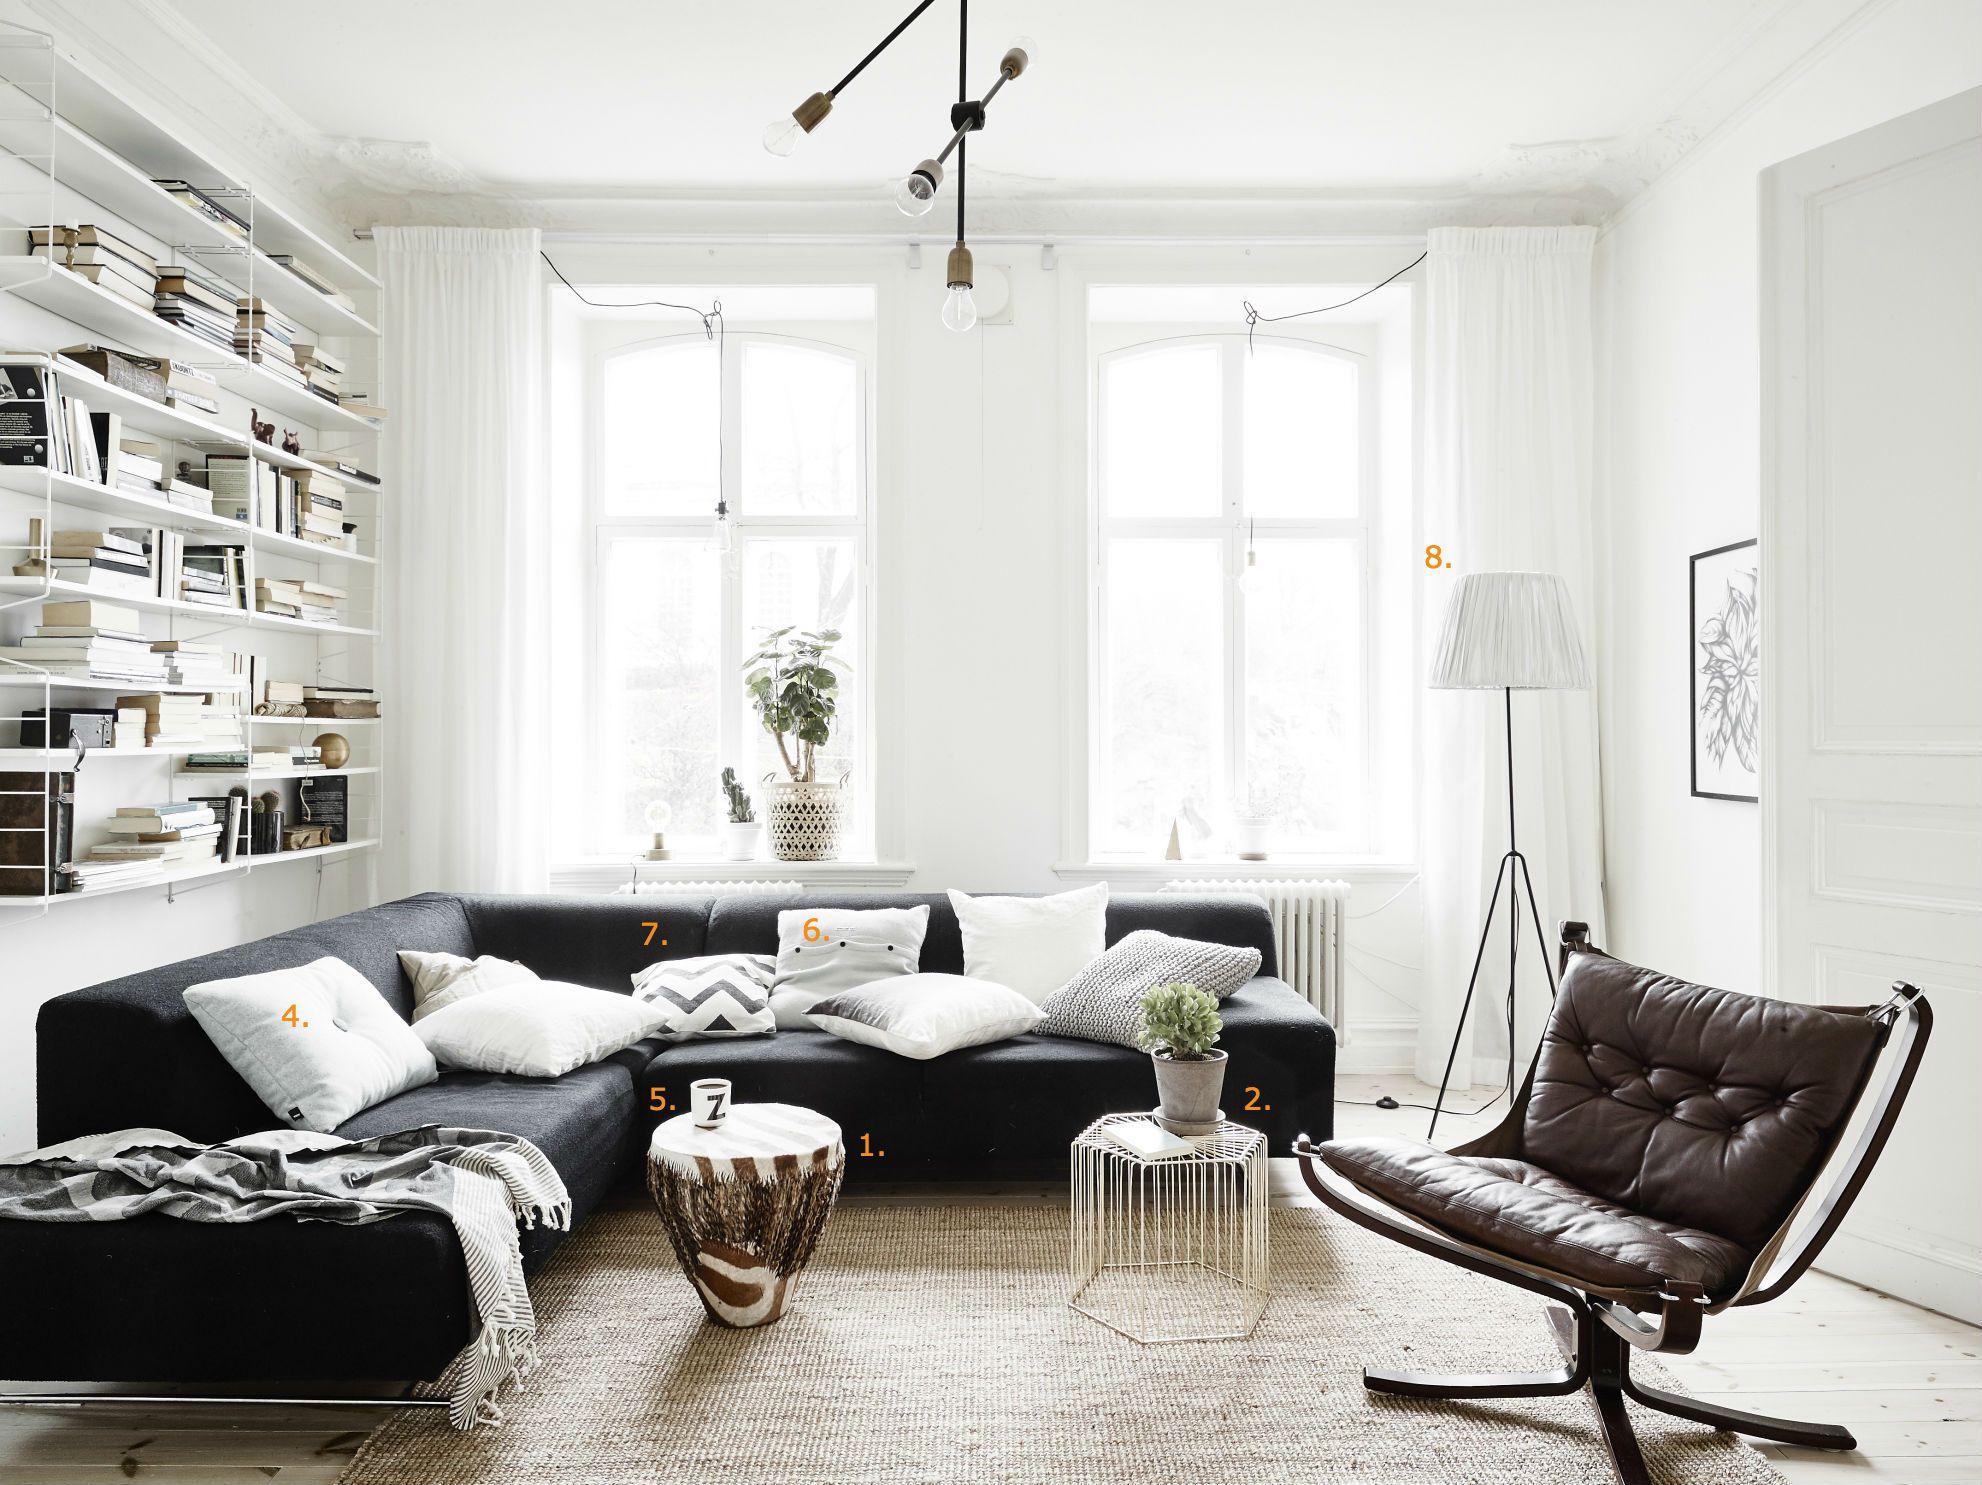 Explore Scandinavian Interiors and more Shop the